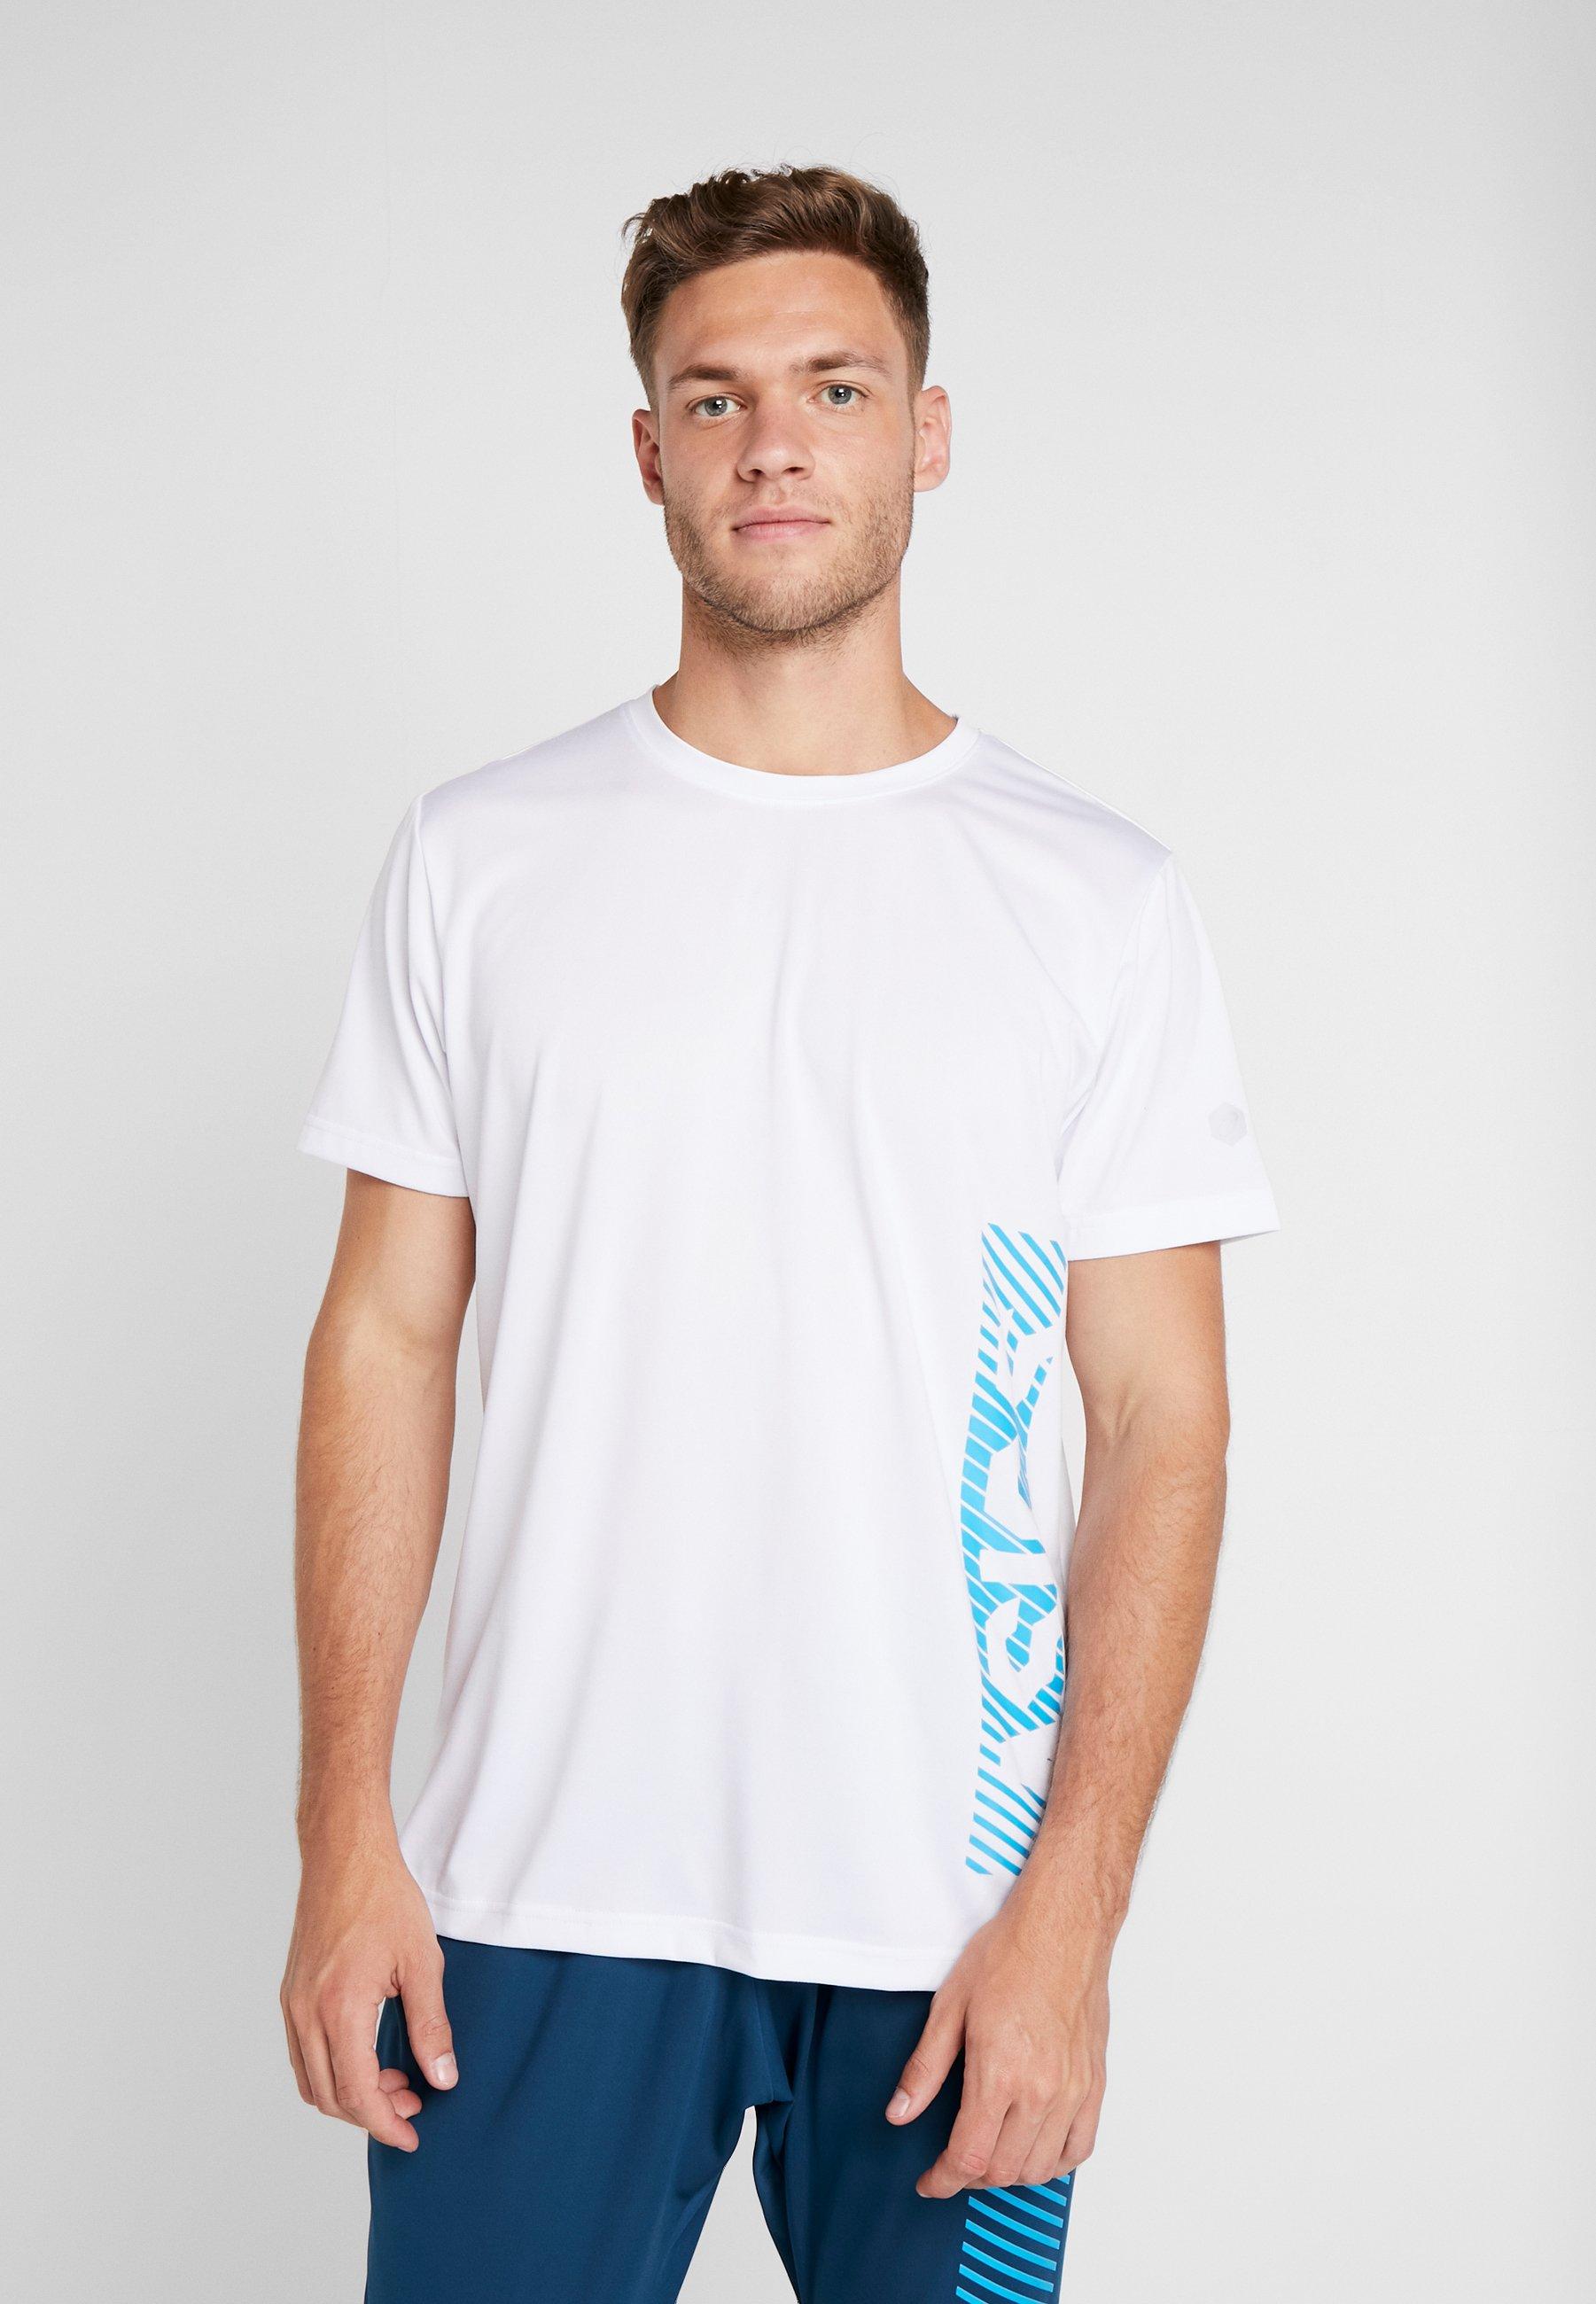 island Asics T shirt Blue ImpriméBrilliant White sQdBtCrxh